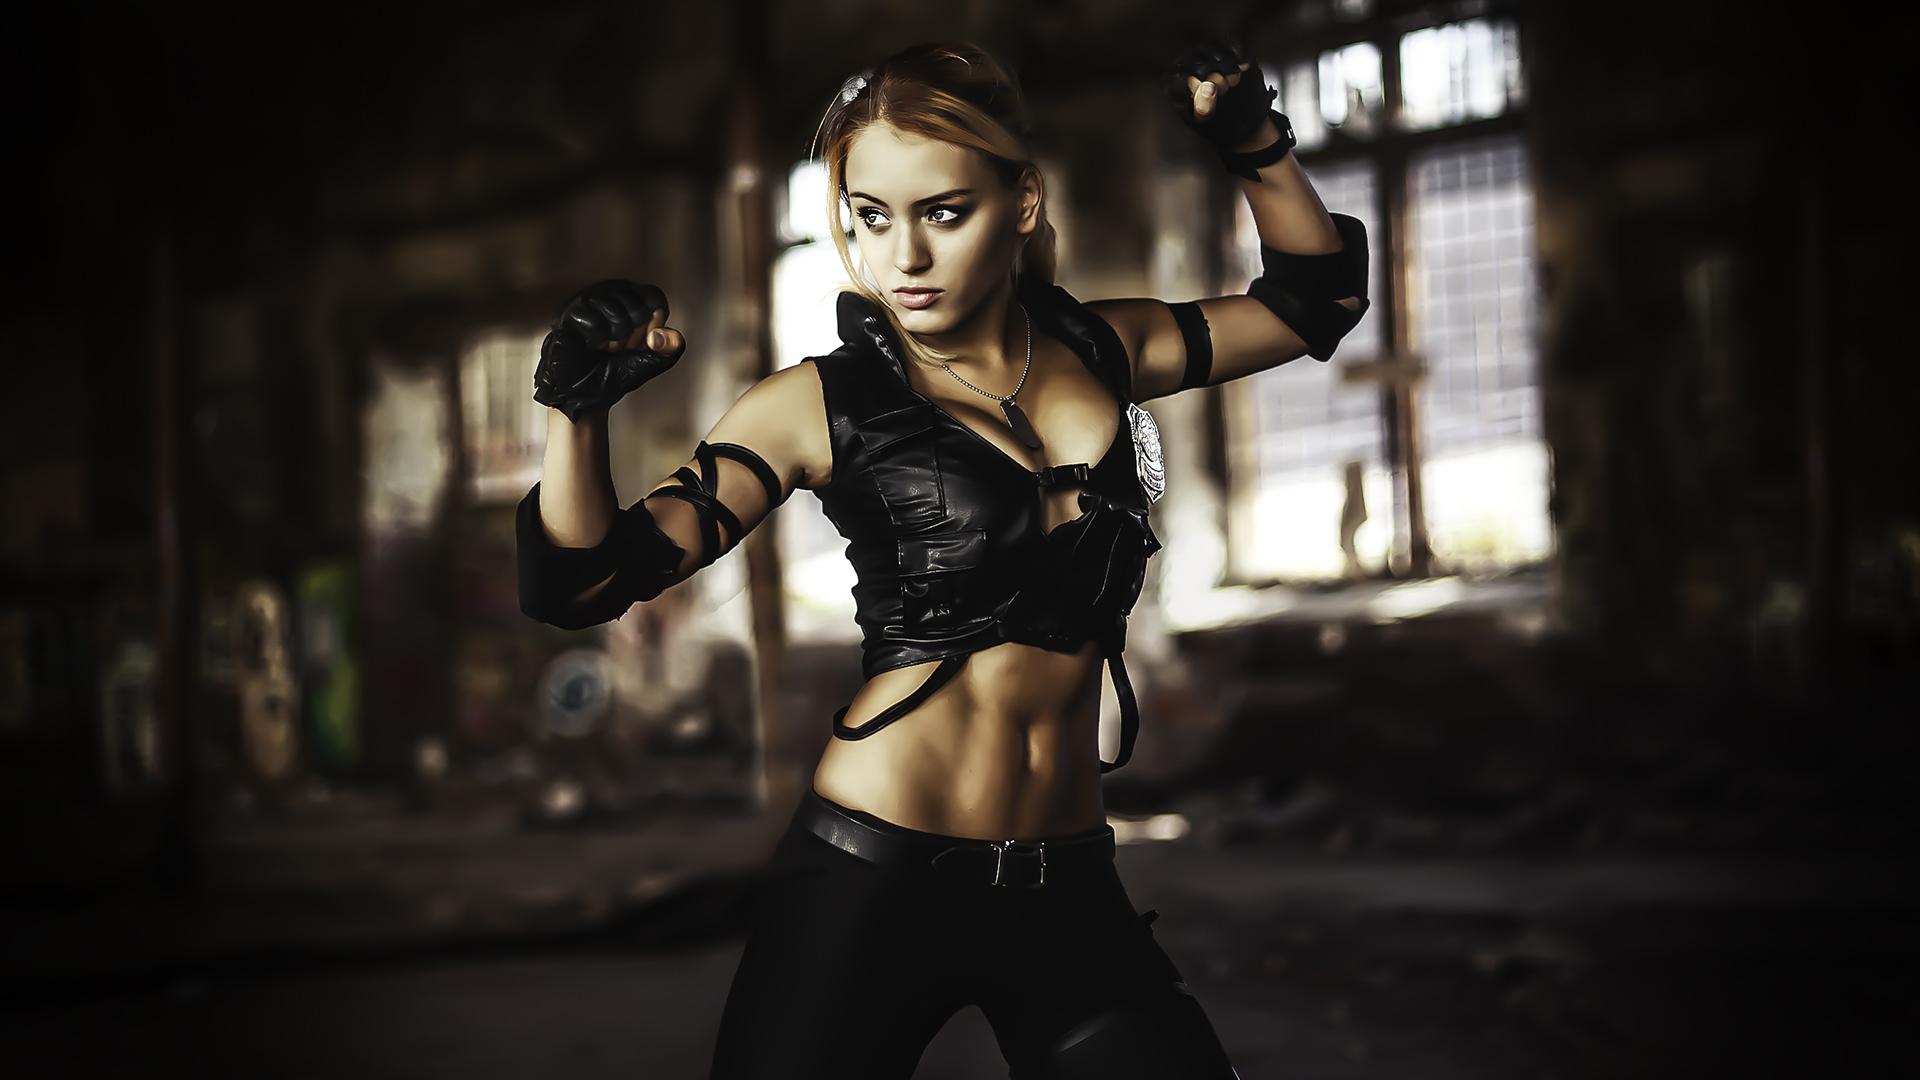 Anime Killer Girl Wallpaper Mortal Kombat Sonya Ps4wallpapers Com